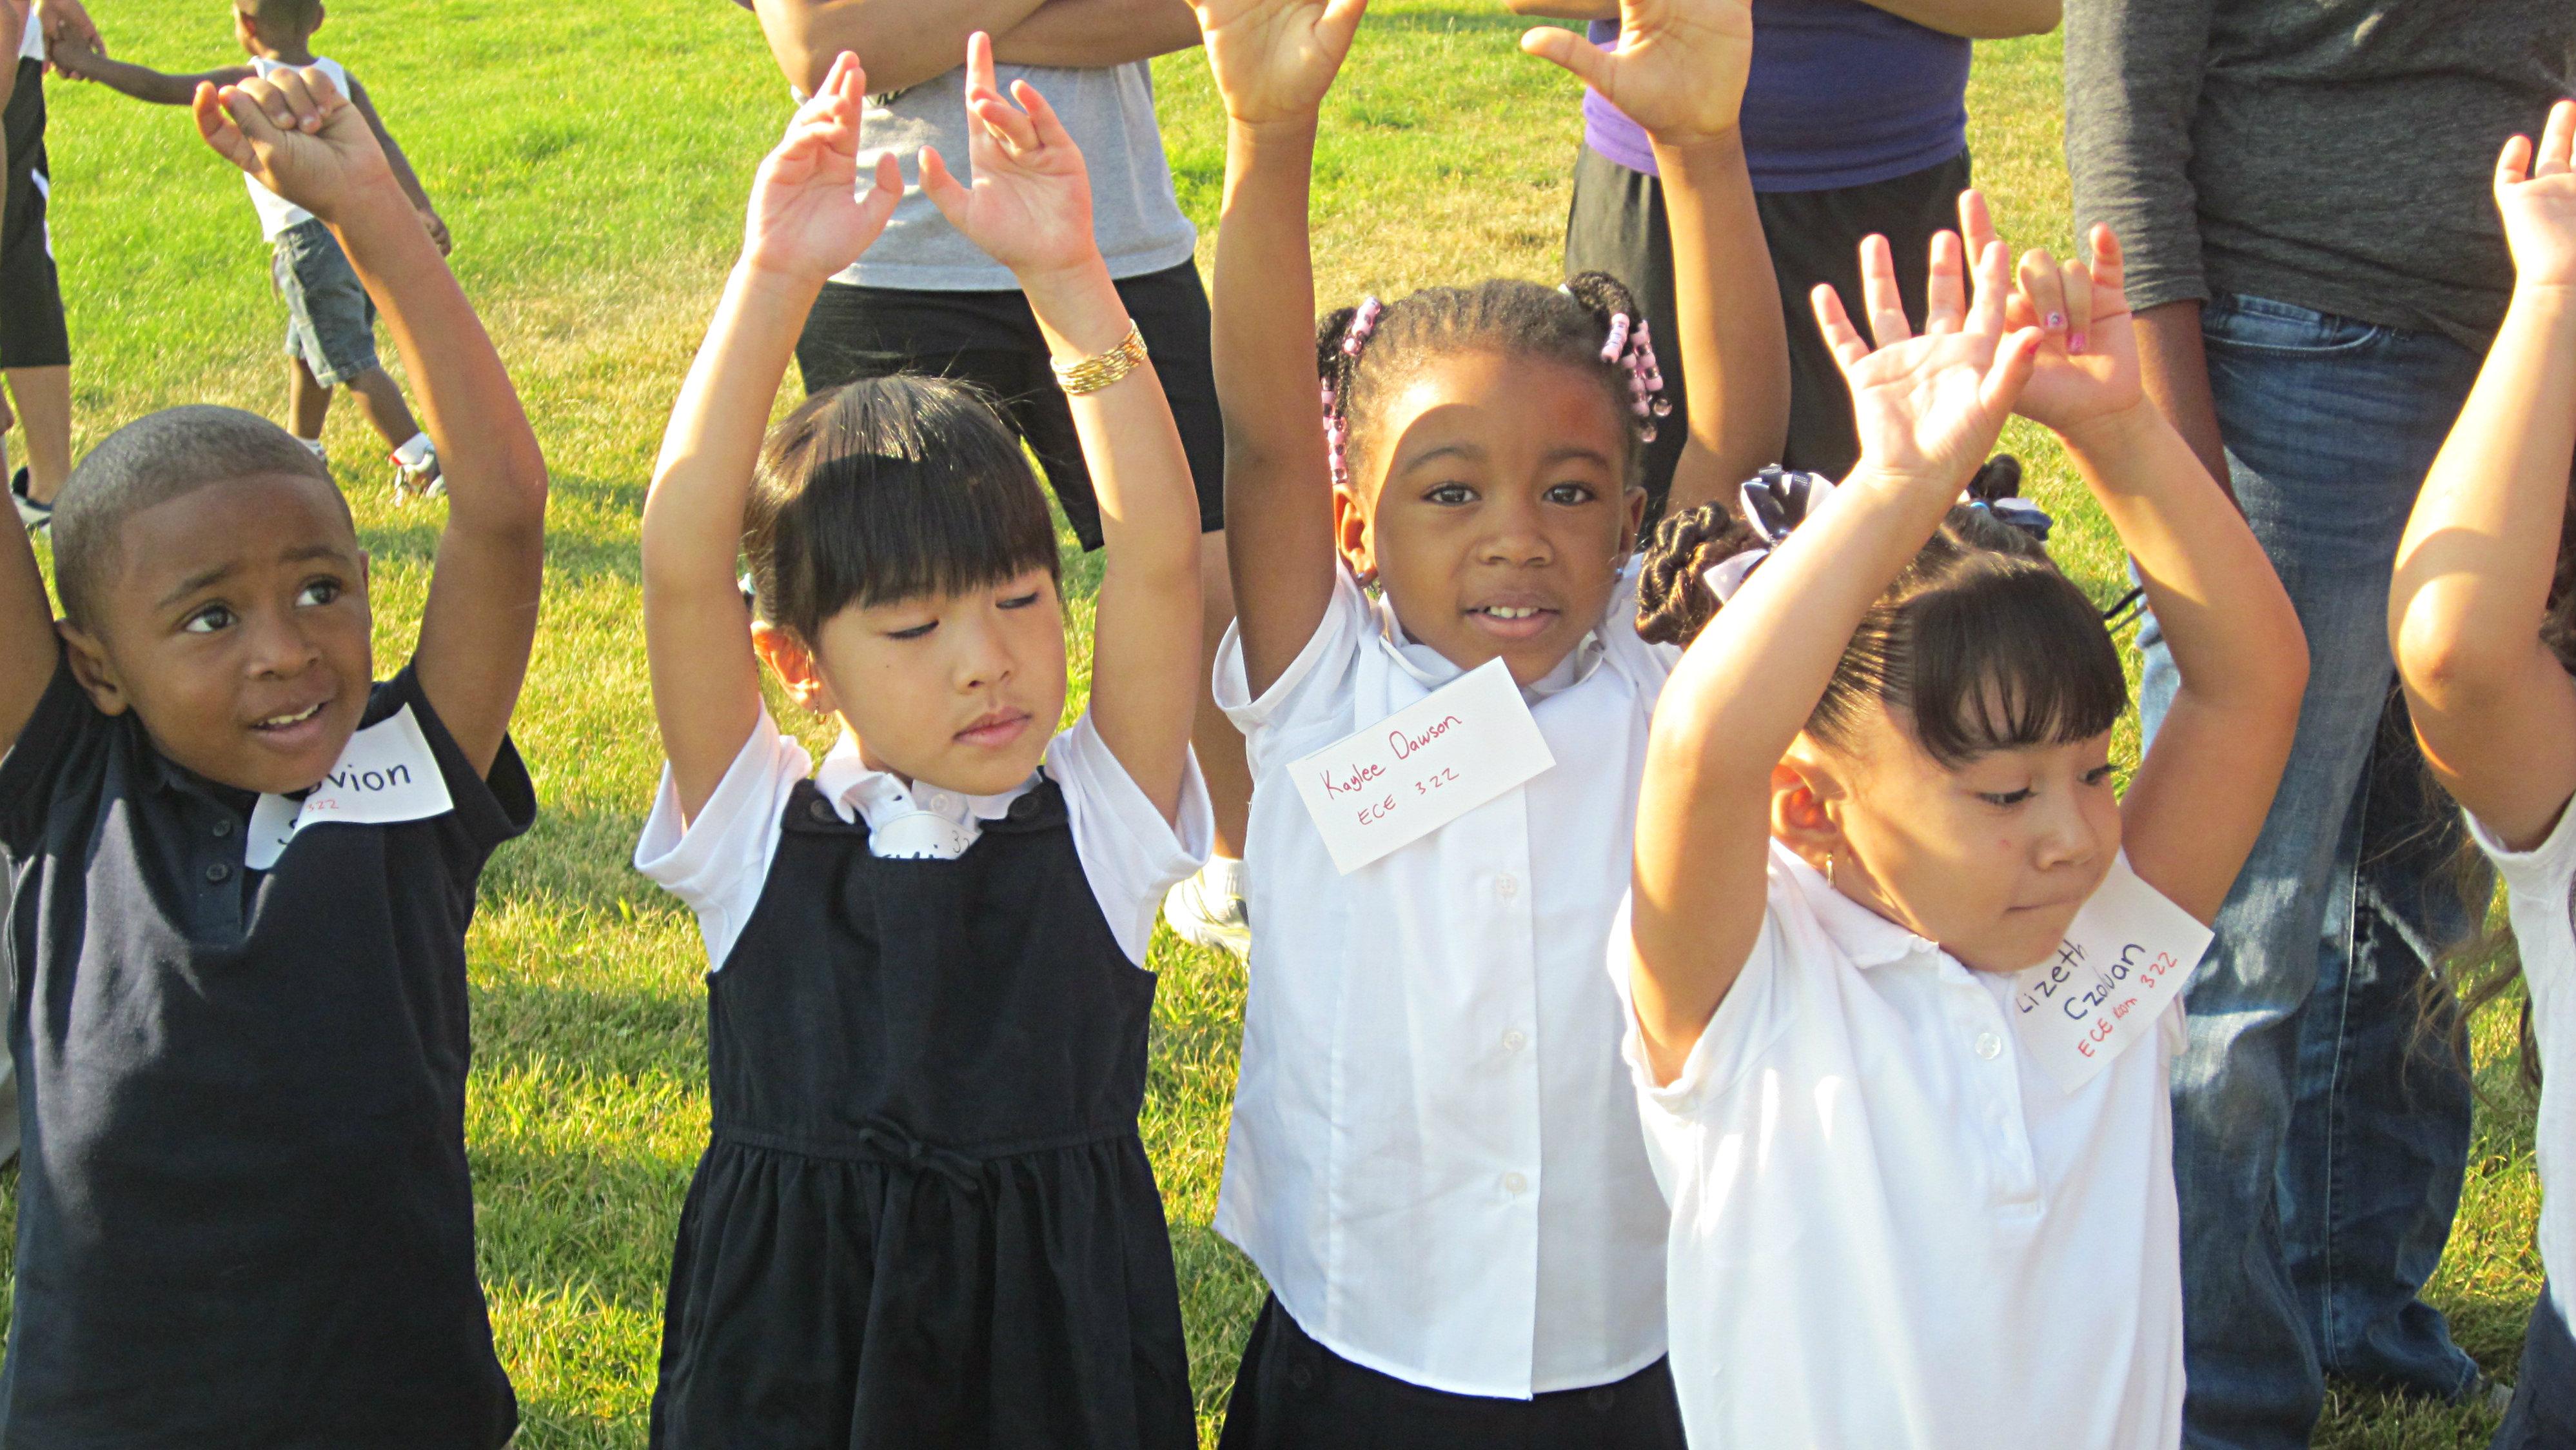 Photo: Green Valley Elementary